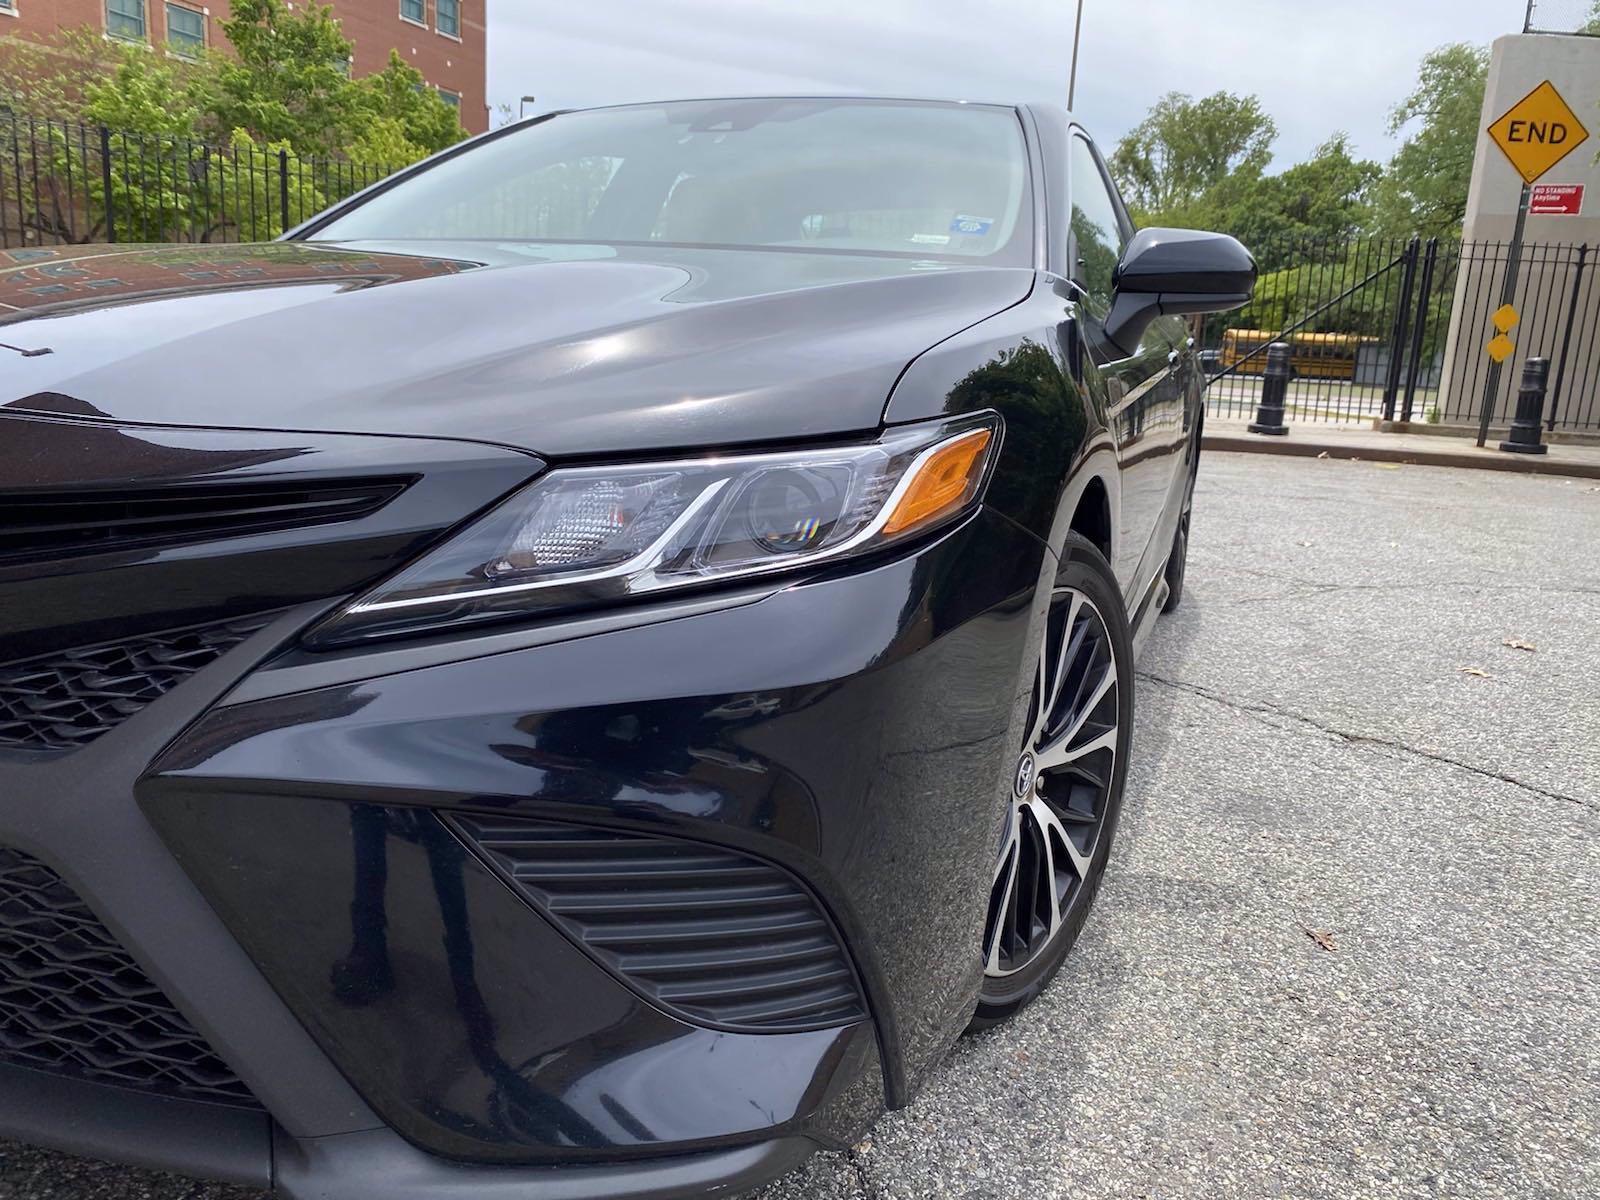 Used-2018-Toyota-Camry-SE